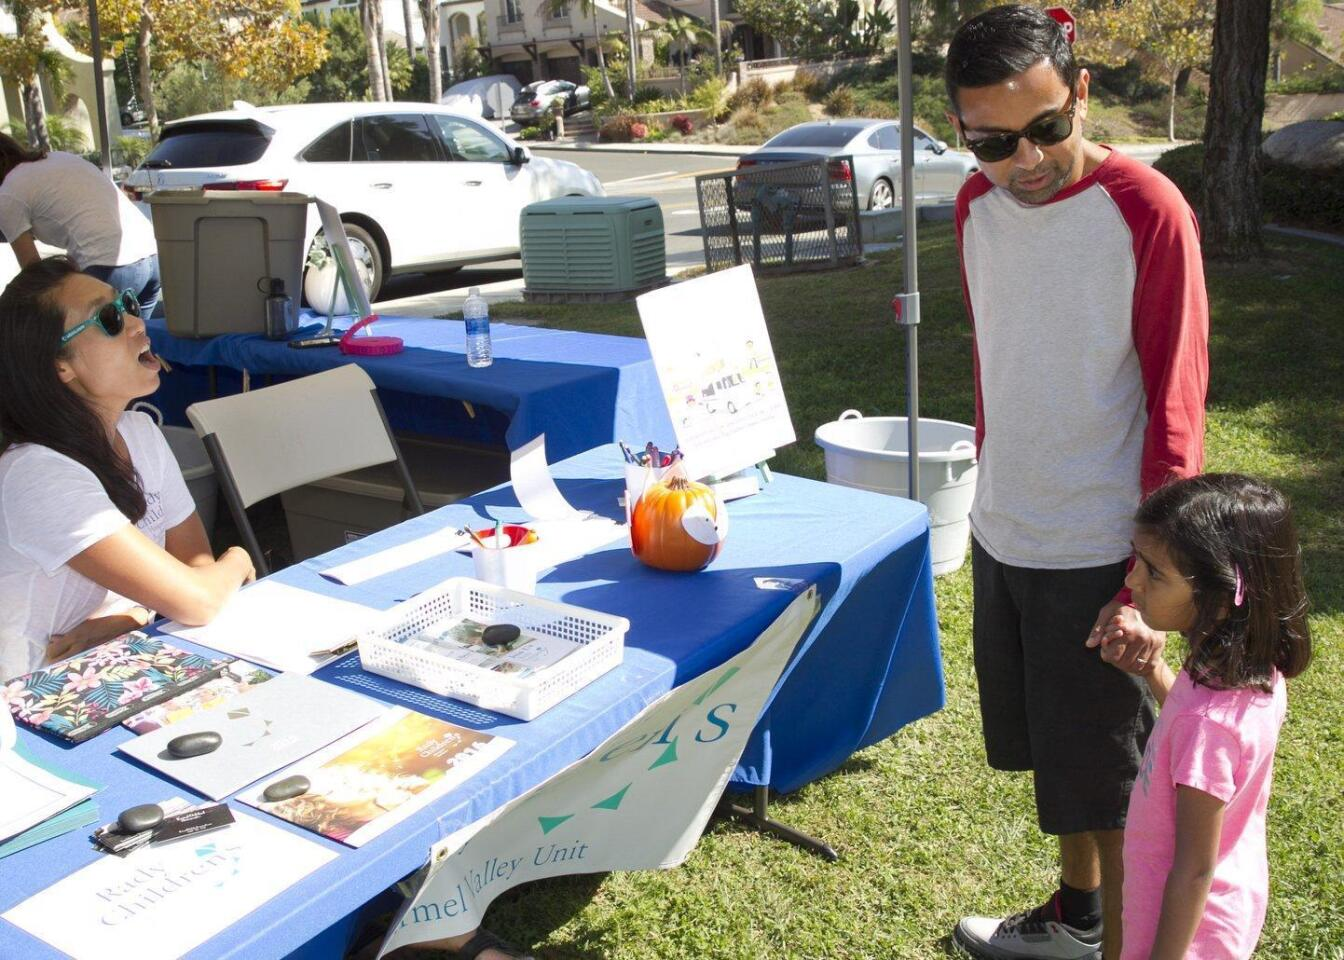 Neighborhood Outreach event for Rady Children's Hospital